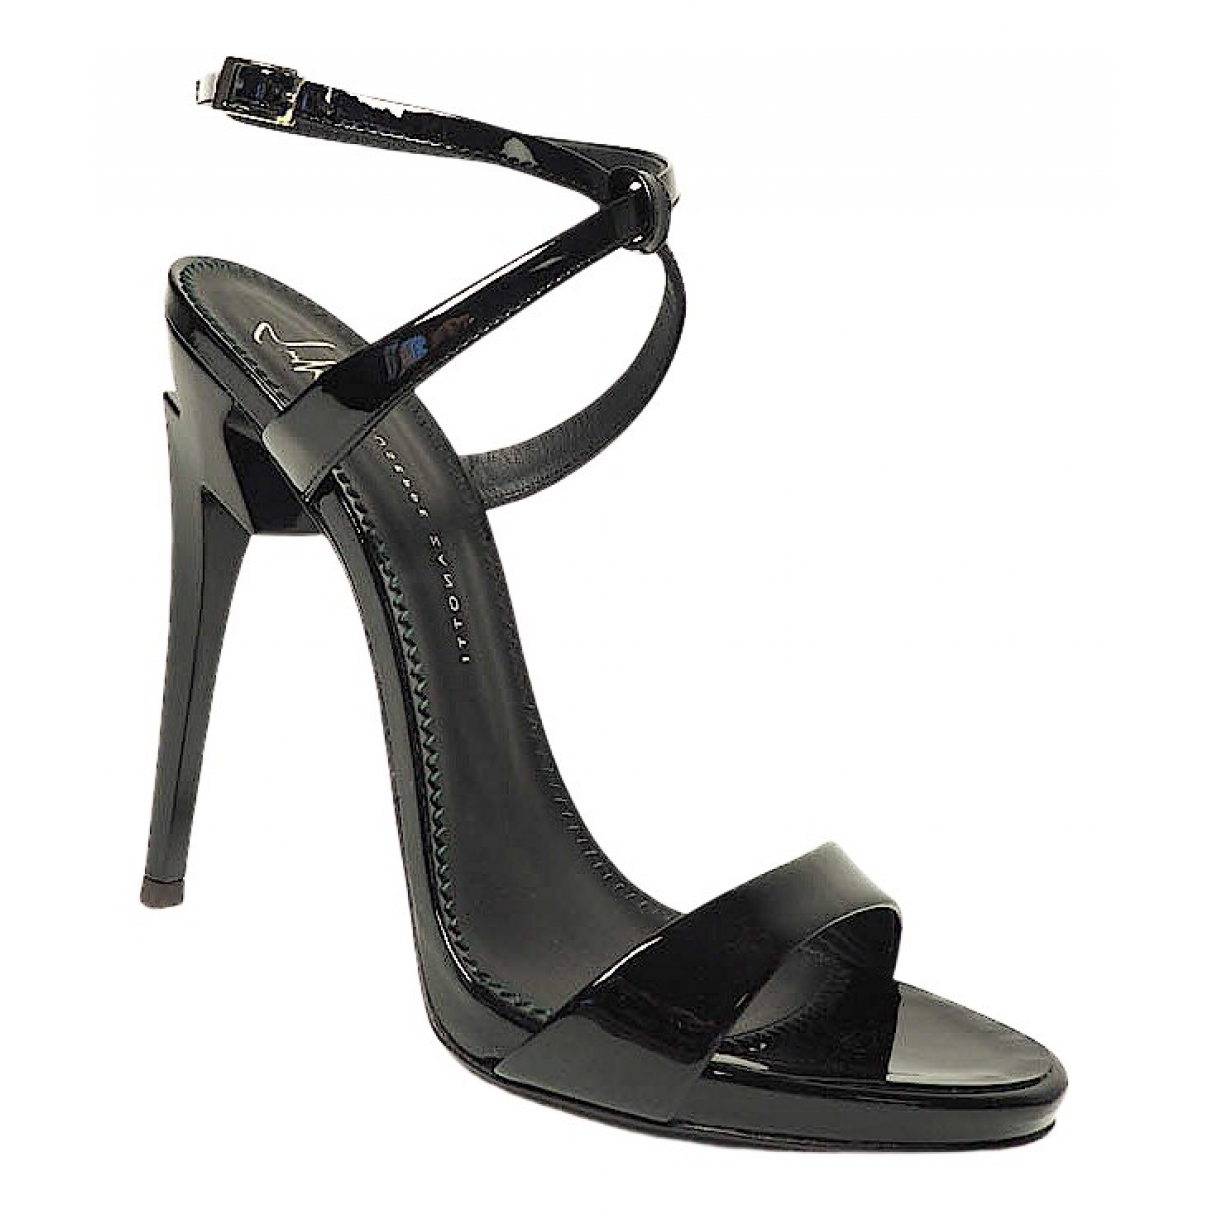 Giuseppe Zanotti N Black Leather Heels for Women 37 EU